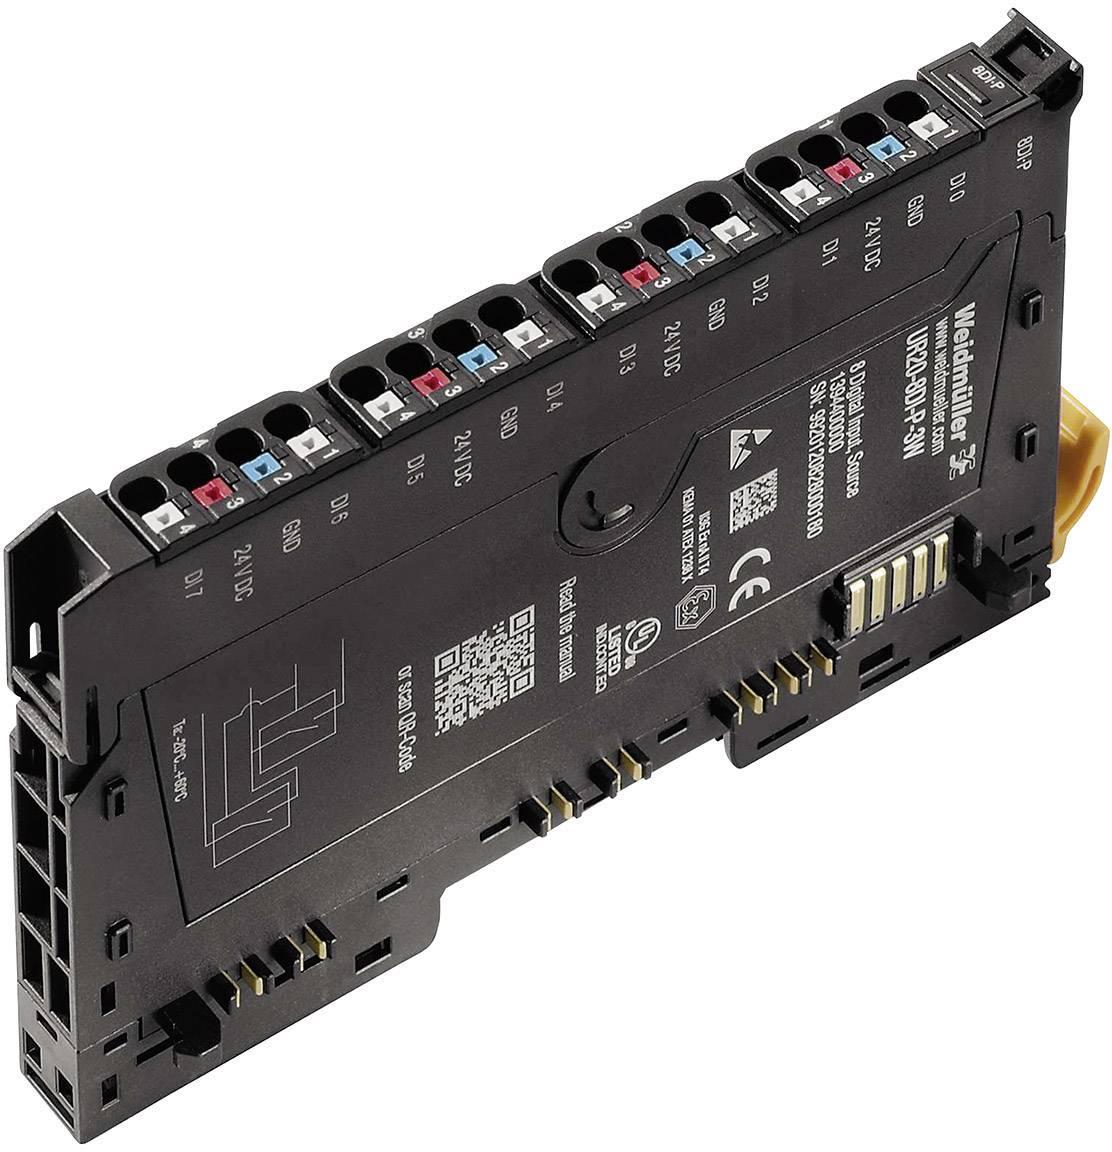 Vstupní modul pro PLC Weidmüller UR20-4DI-P, 1315170000